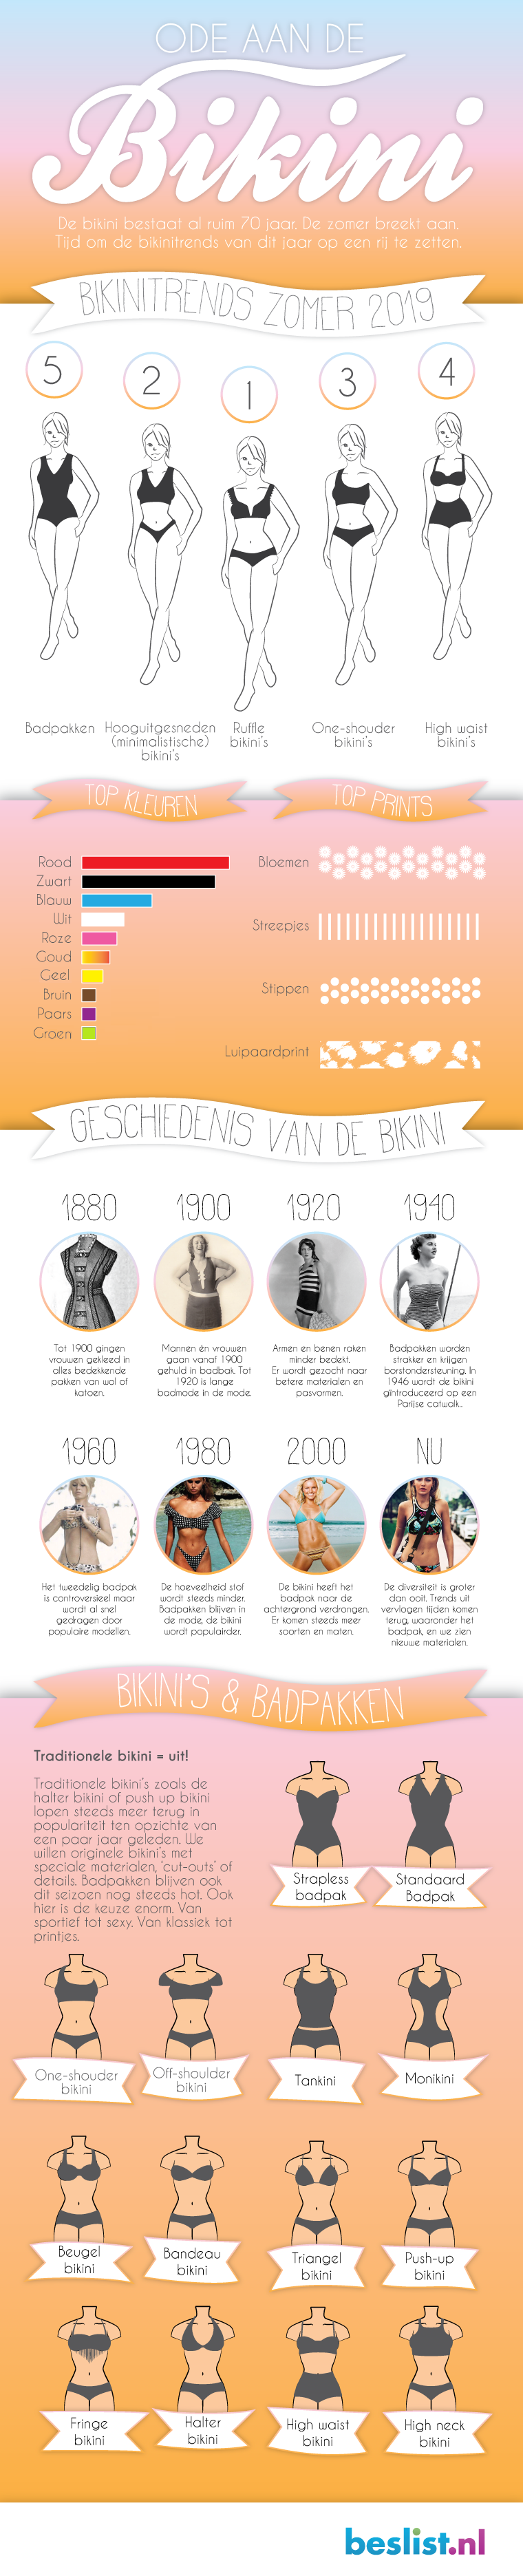 Infographic Bikini Trends 2019